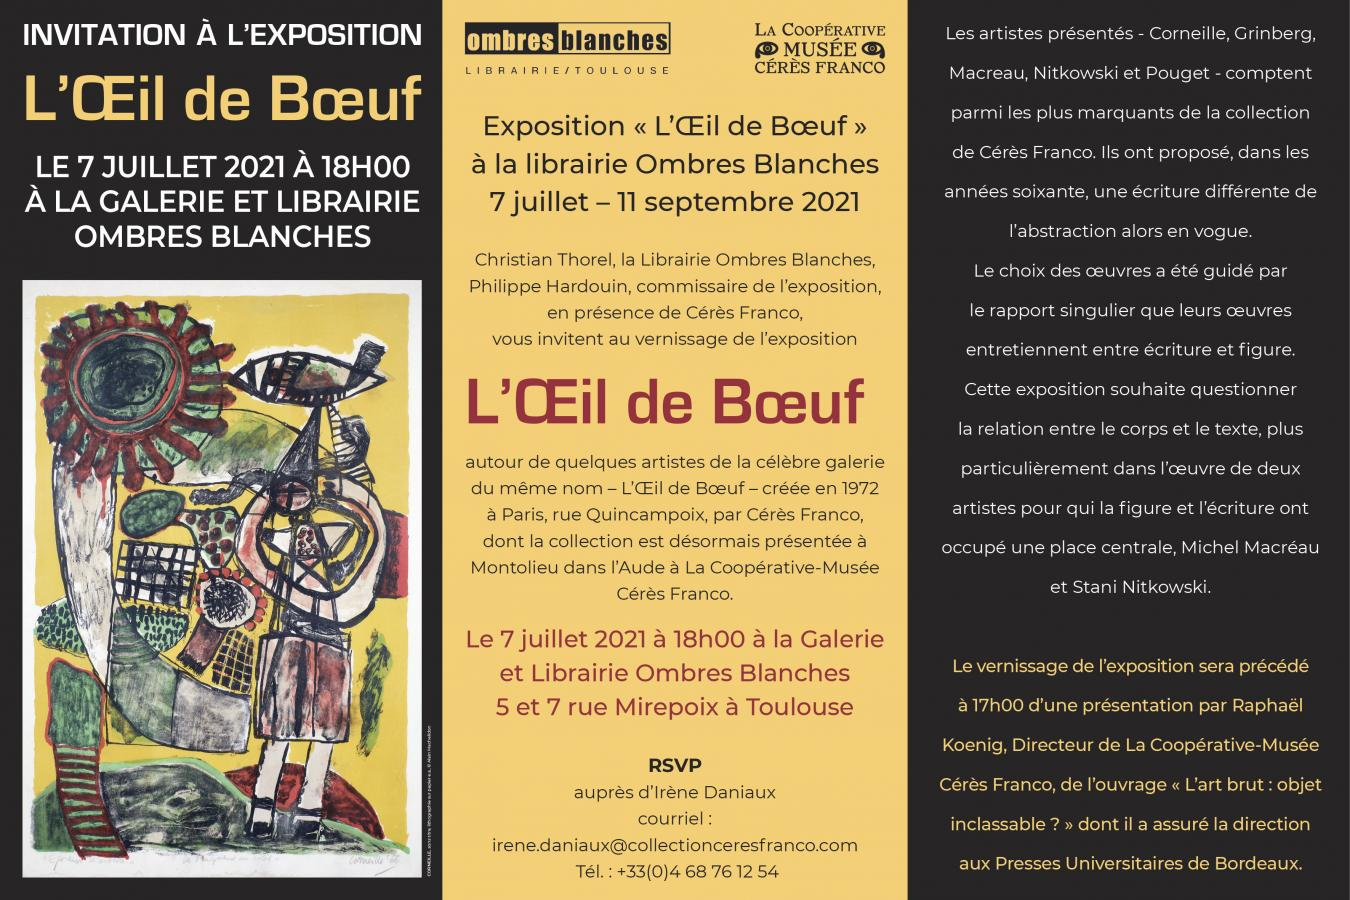 2021-06-23_Invitation_OB.jpg